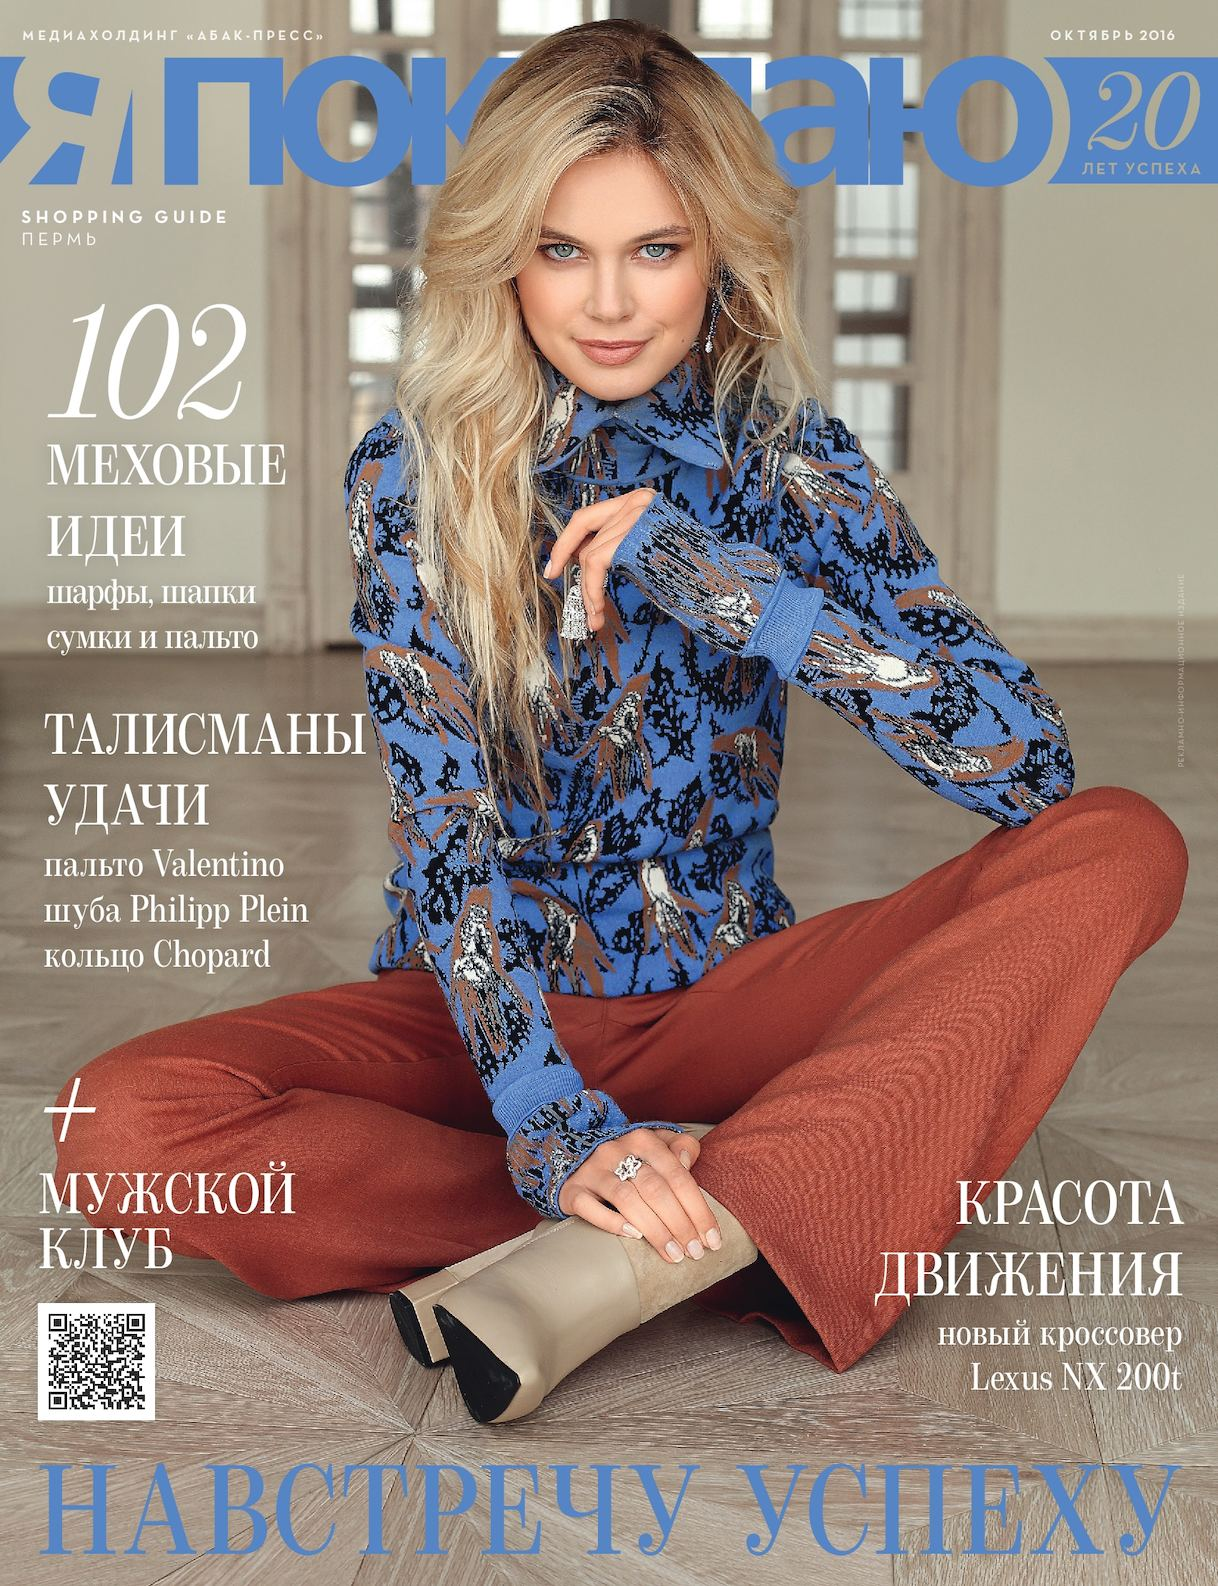 Calaméo - Shopping Guide «Я Покупаю. Пермь» 47bad92151262